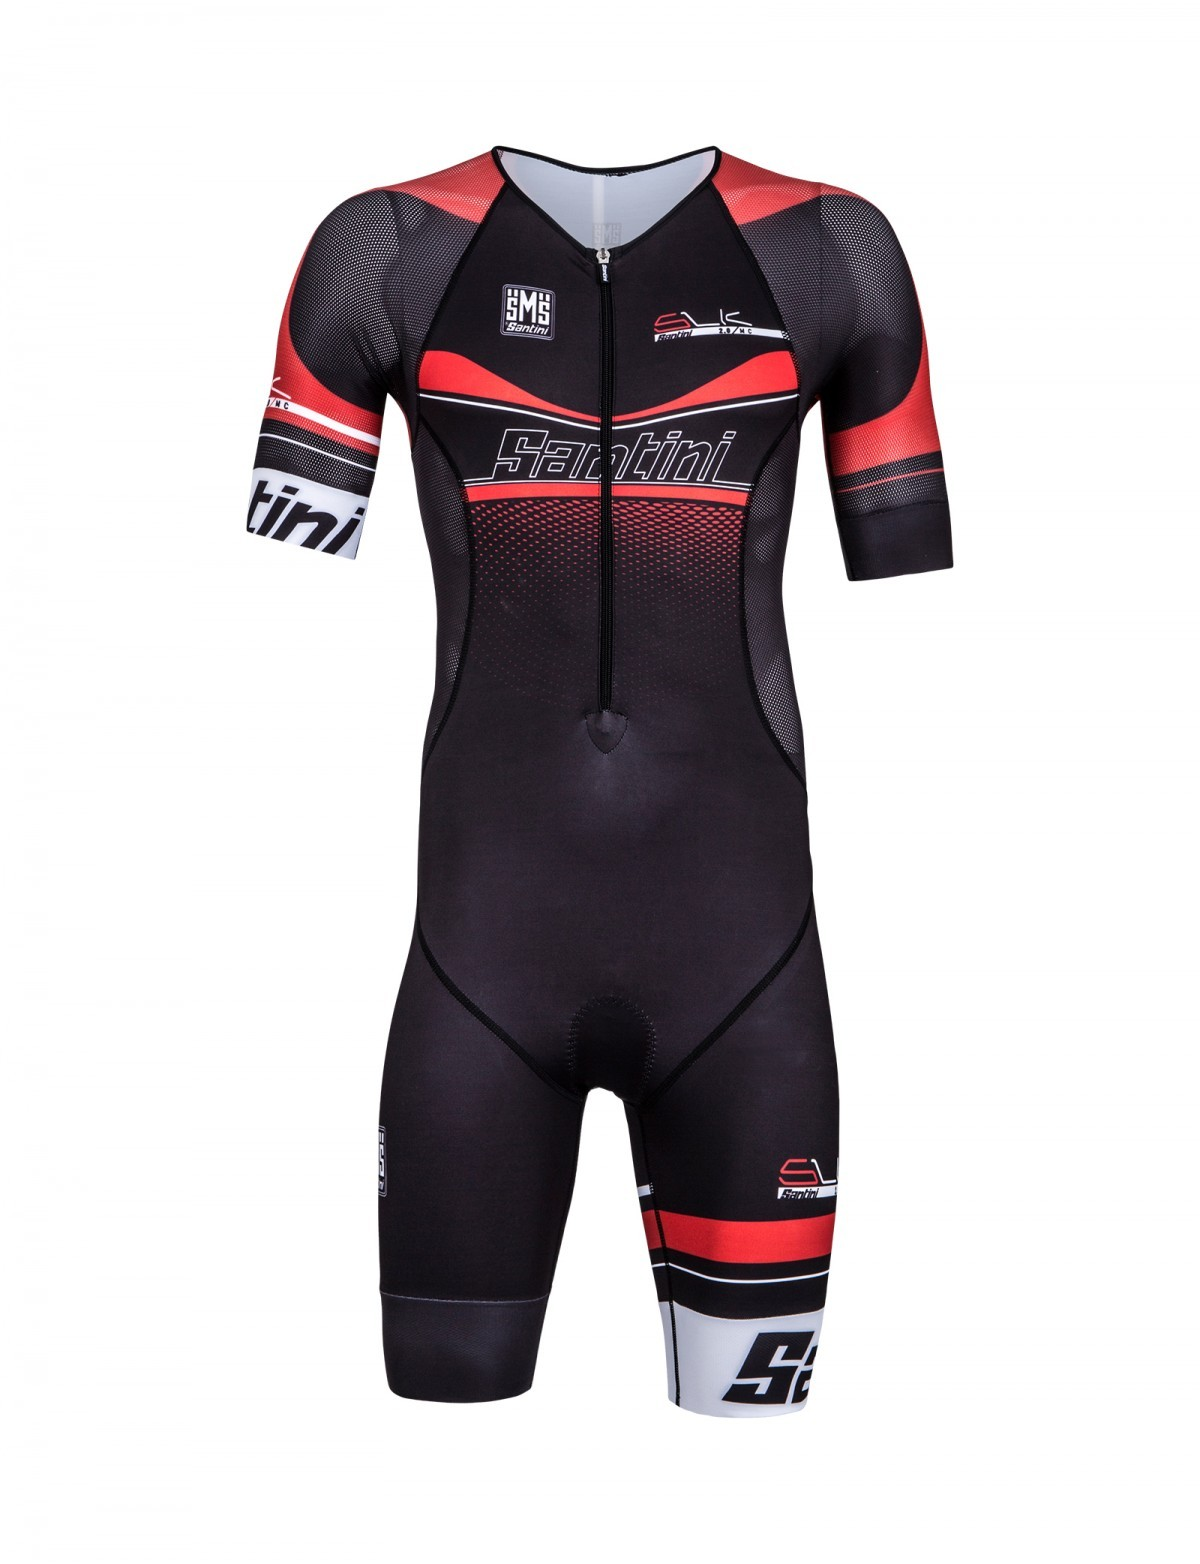 Santini SLEEK 2.0 S s trisuit - DMC Sports 9bcc0c5acf